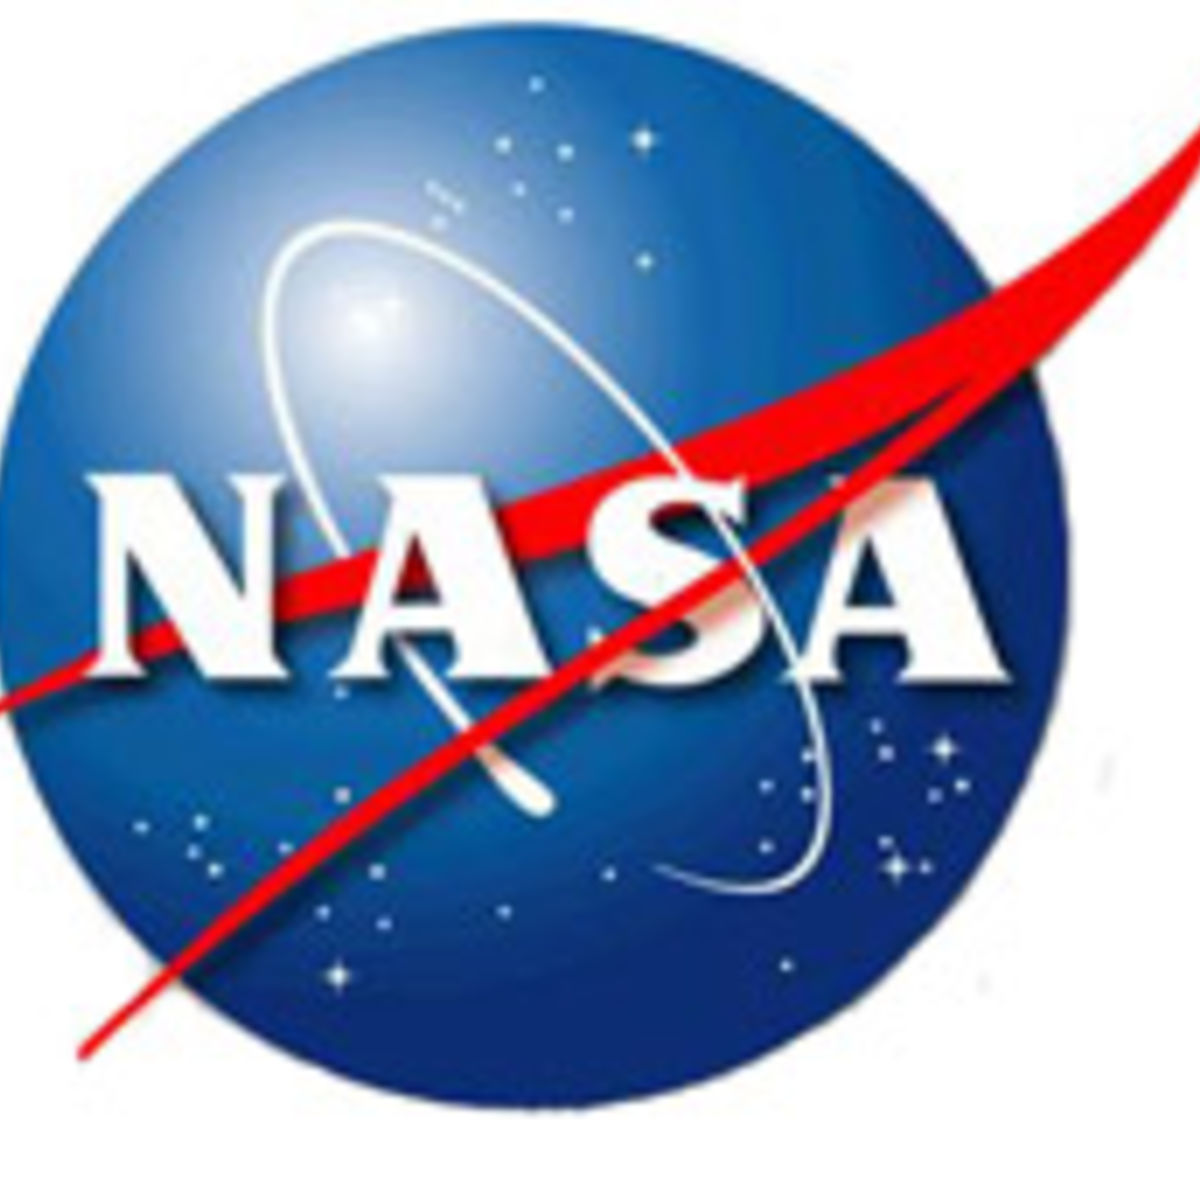 nasa_logo_thumb_2.jpg